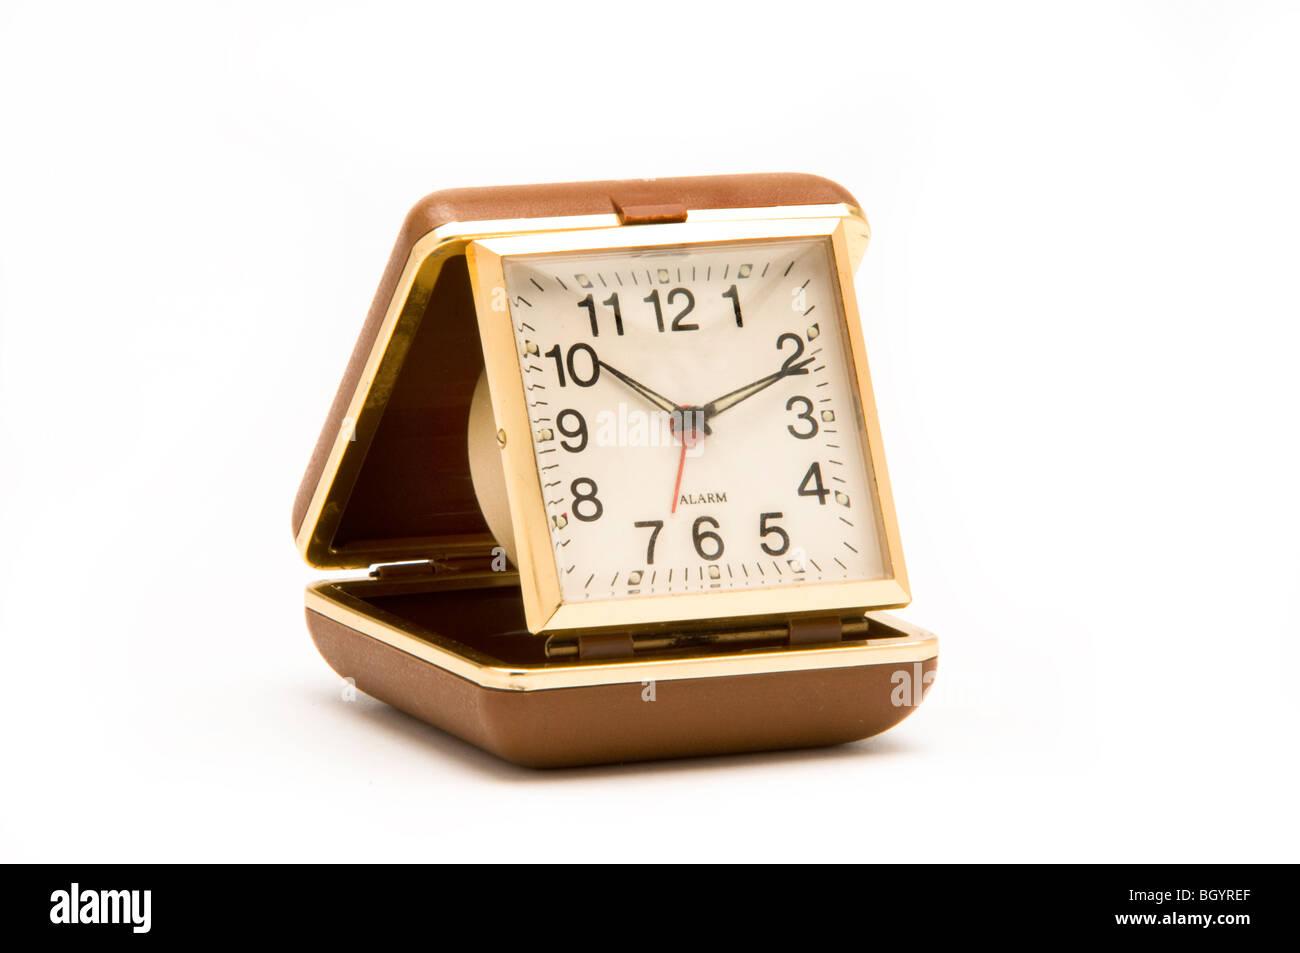 travel alarm clock - Stock Image